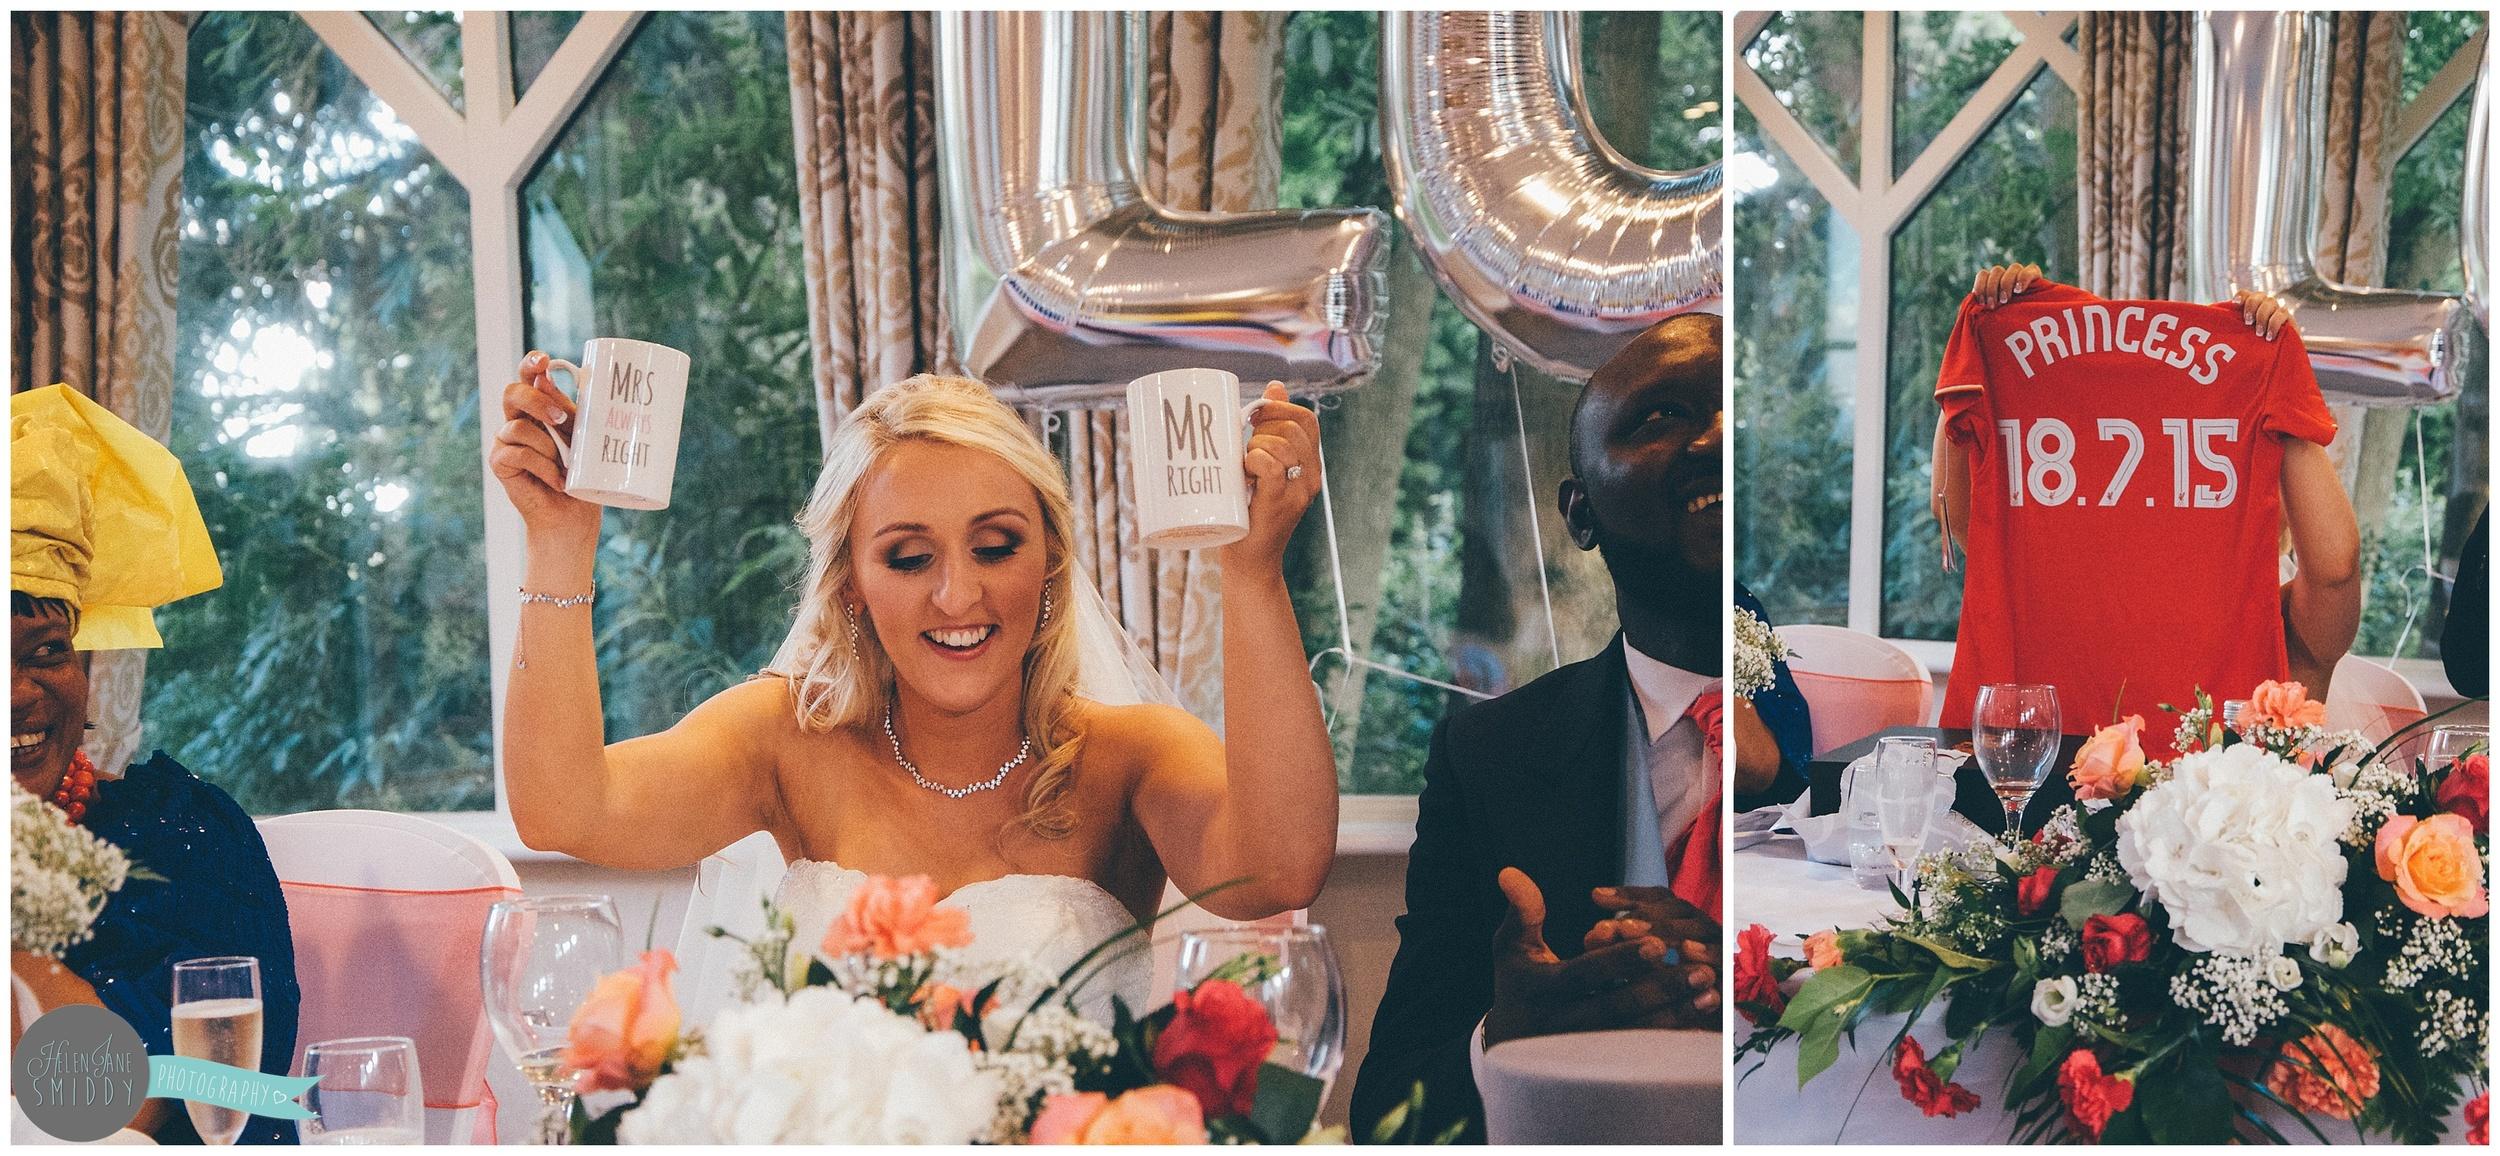 wedding-photography-crabwall-manor-cheshire-wedding-photographer-north-west-england-nigerian-wedding-balloons